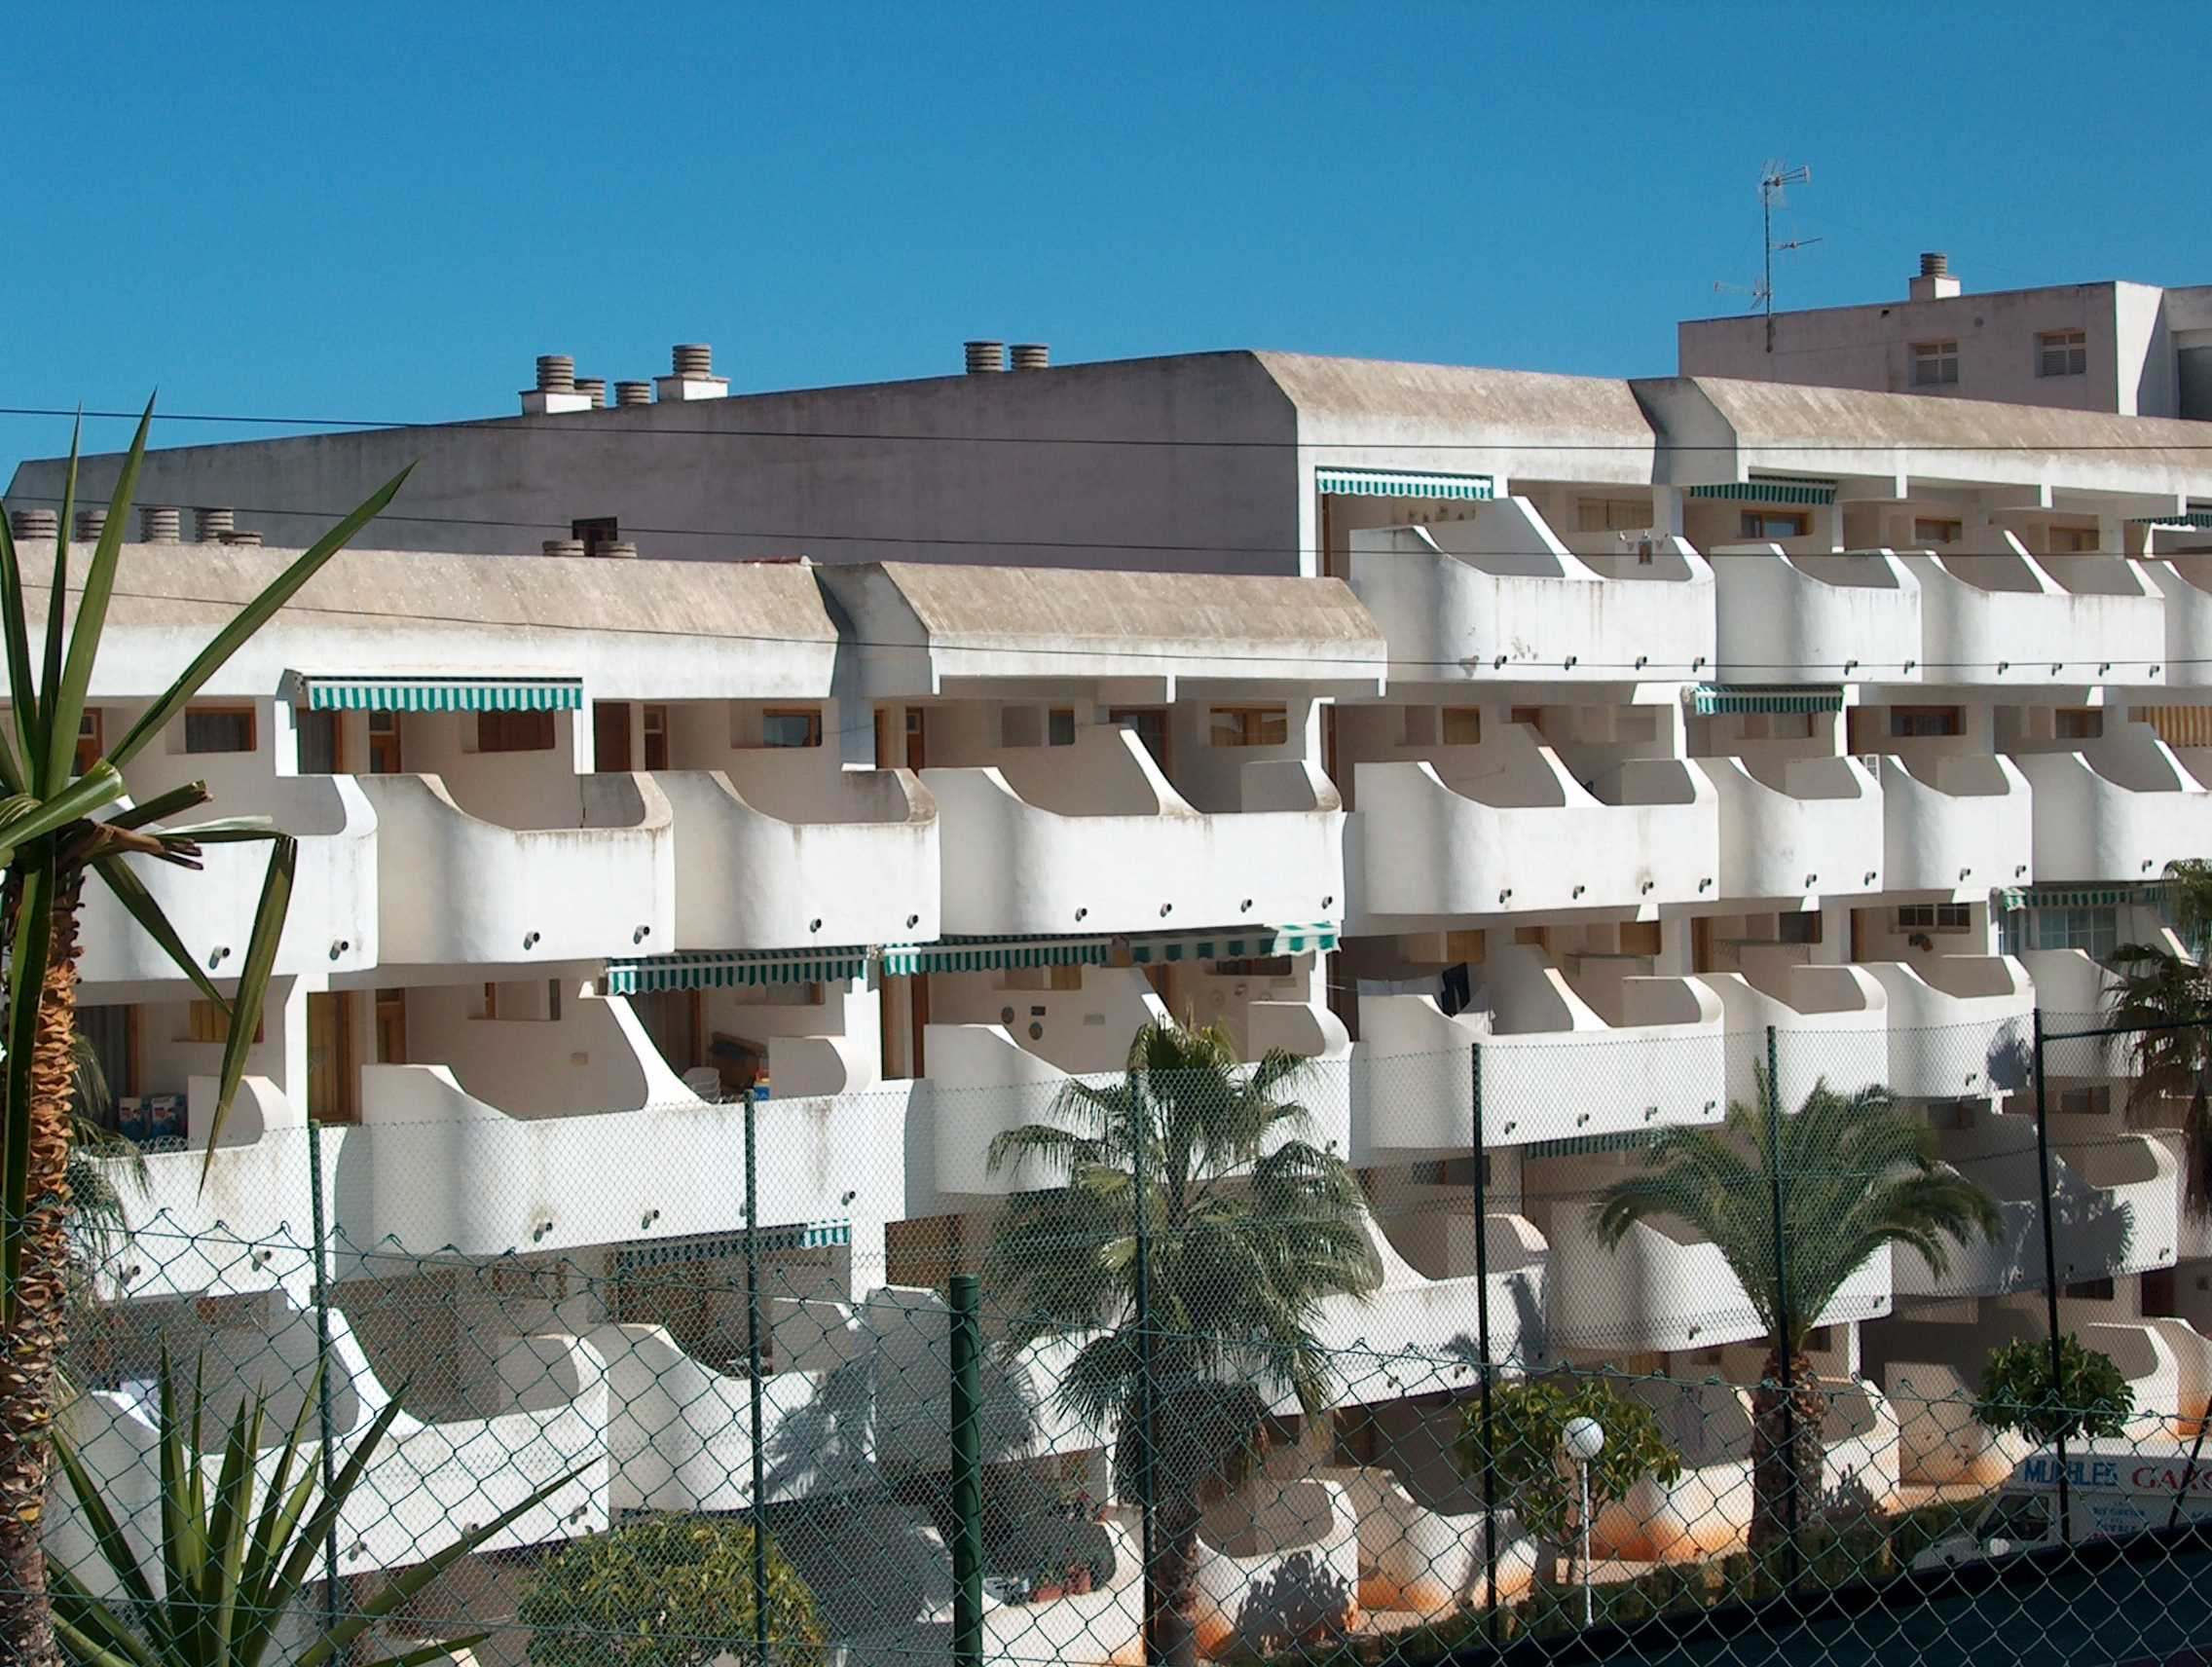 Hotel Arcos 2 - ArcosIIbloque